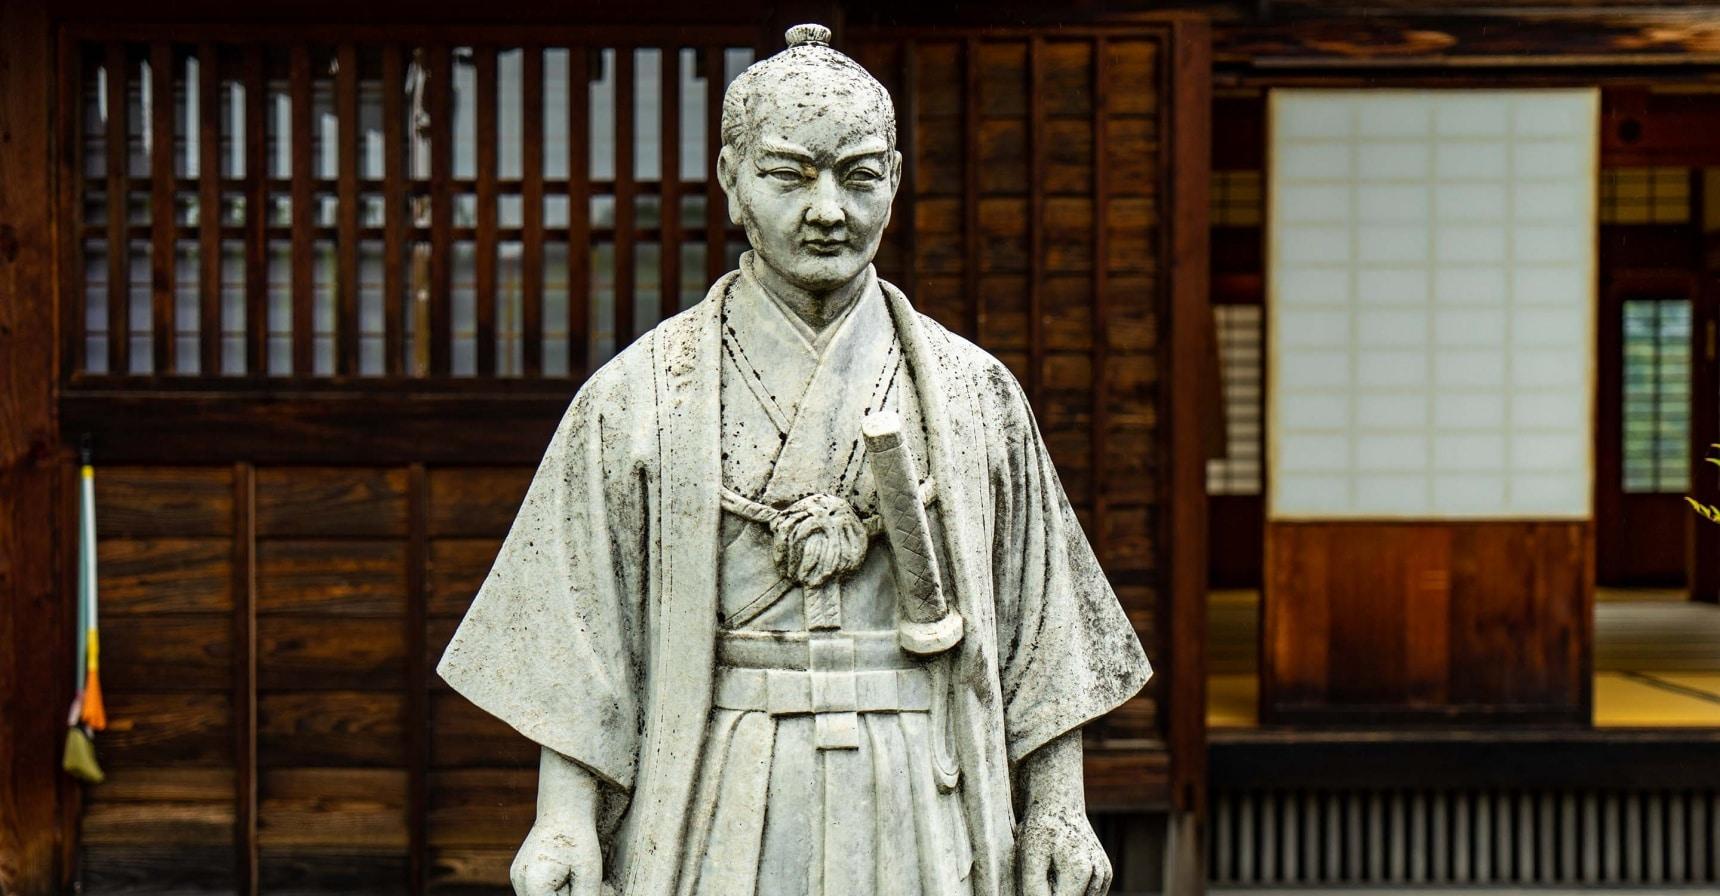 The Last Samurai of Aizuwakamatsu